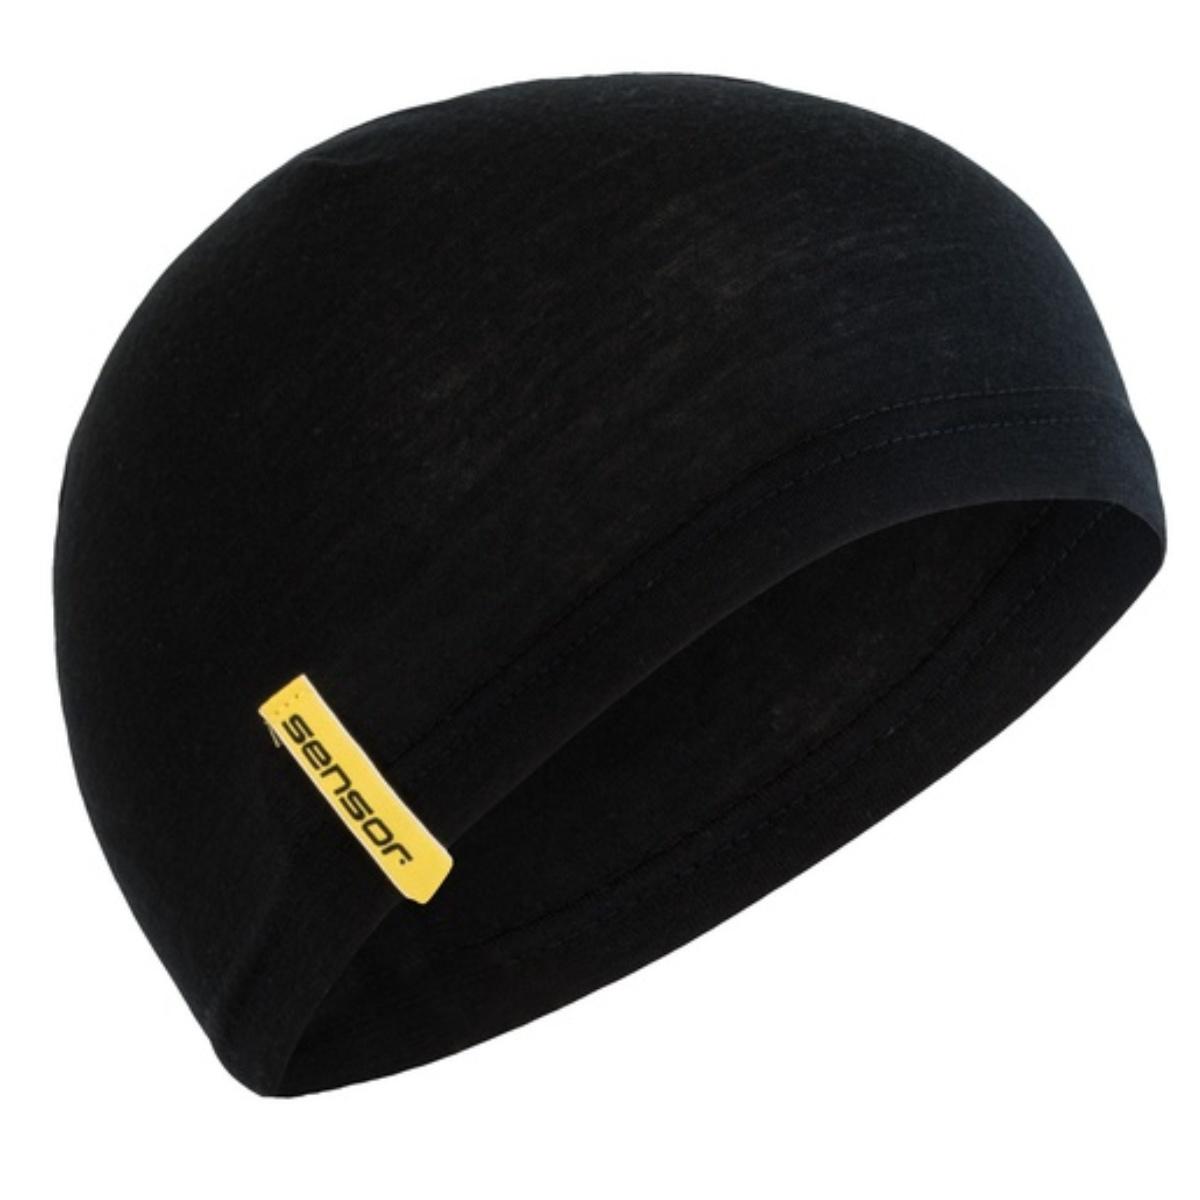 Sensor čepice Merino Under černá